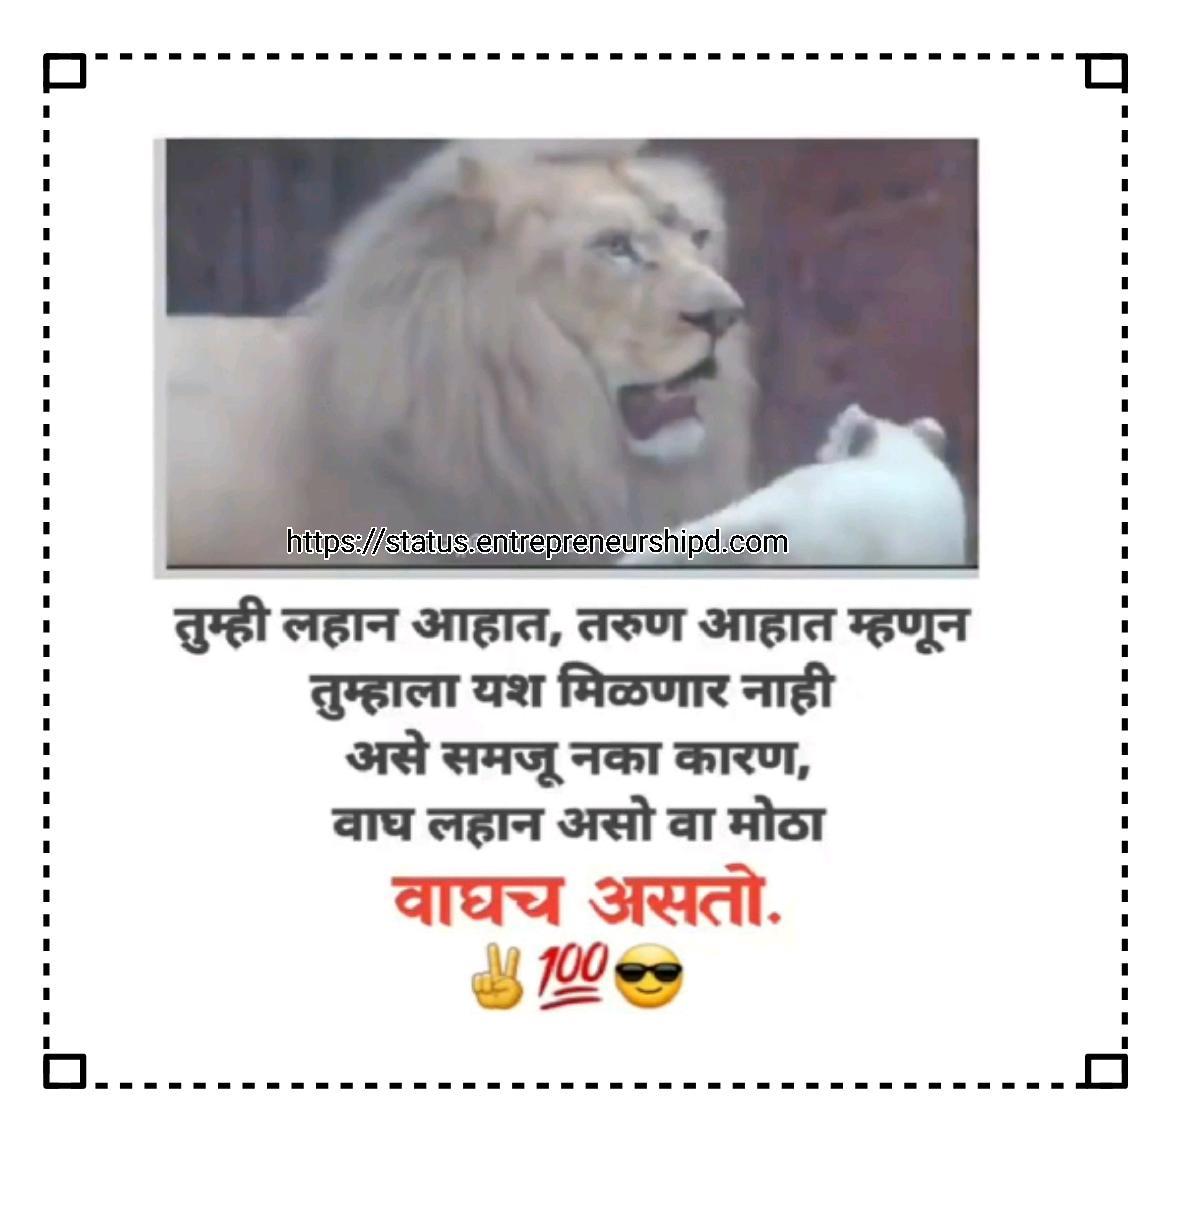 Royal karbhar marathi attitude status Khatarnak attitude status marathi Marathi attitude status lines Marathi attitude life status Marathi attitude status 2 line